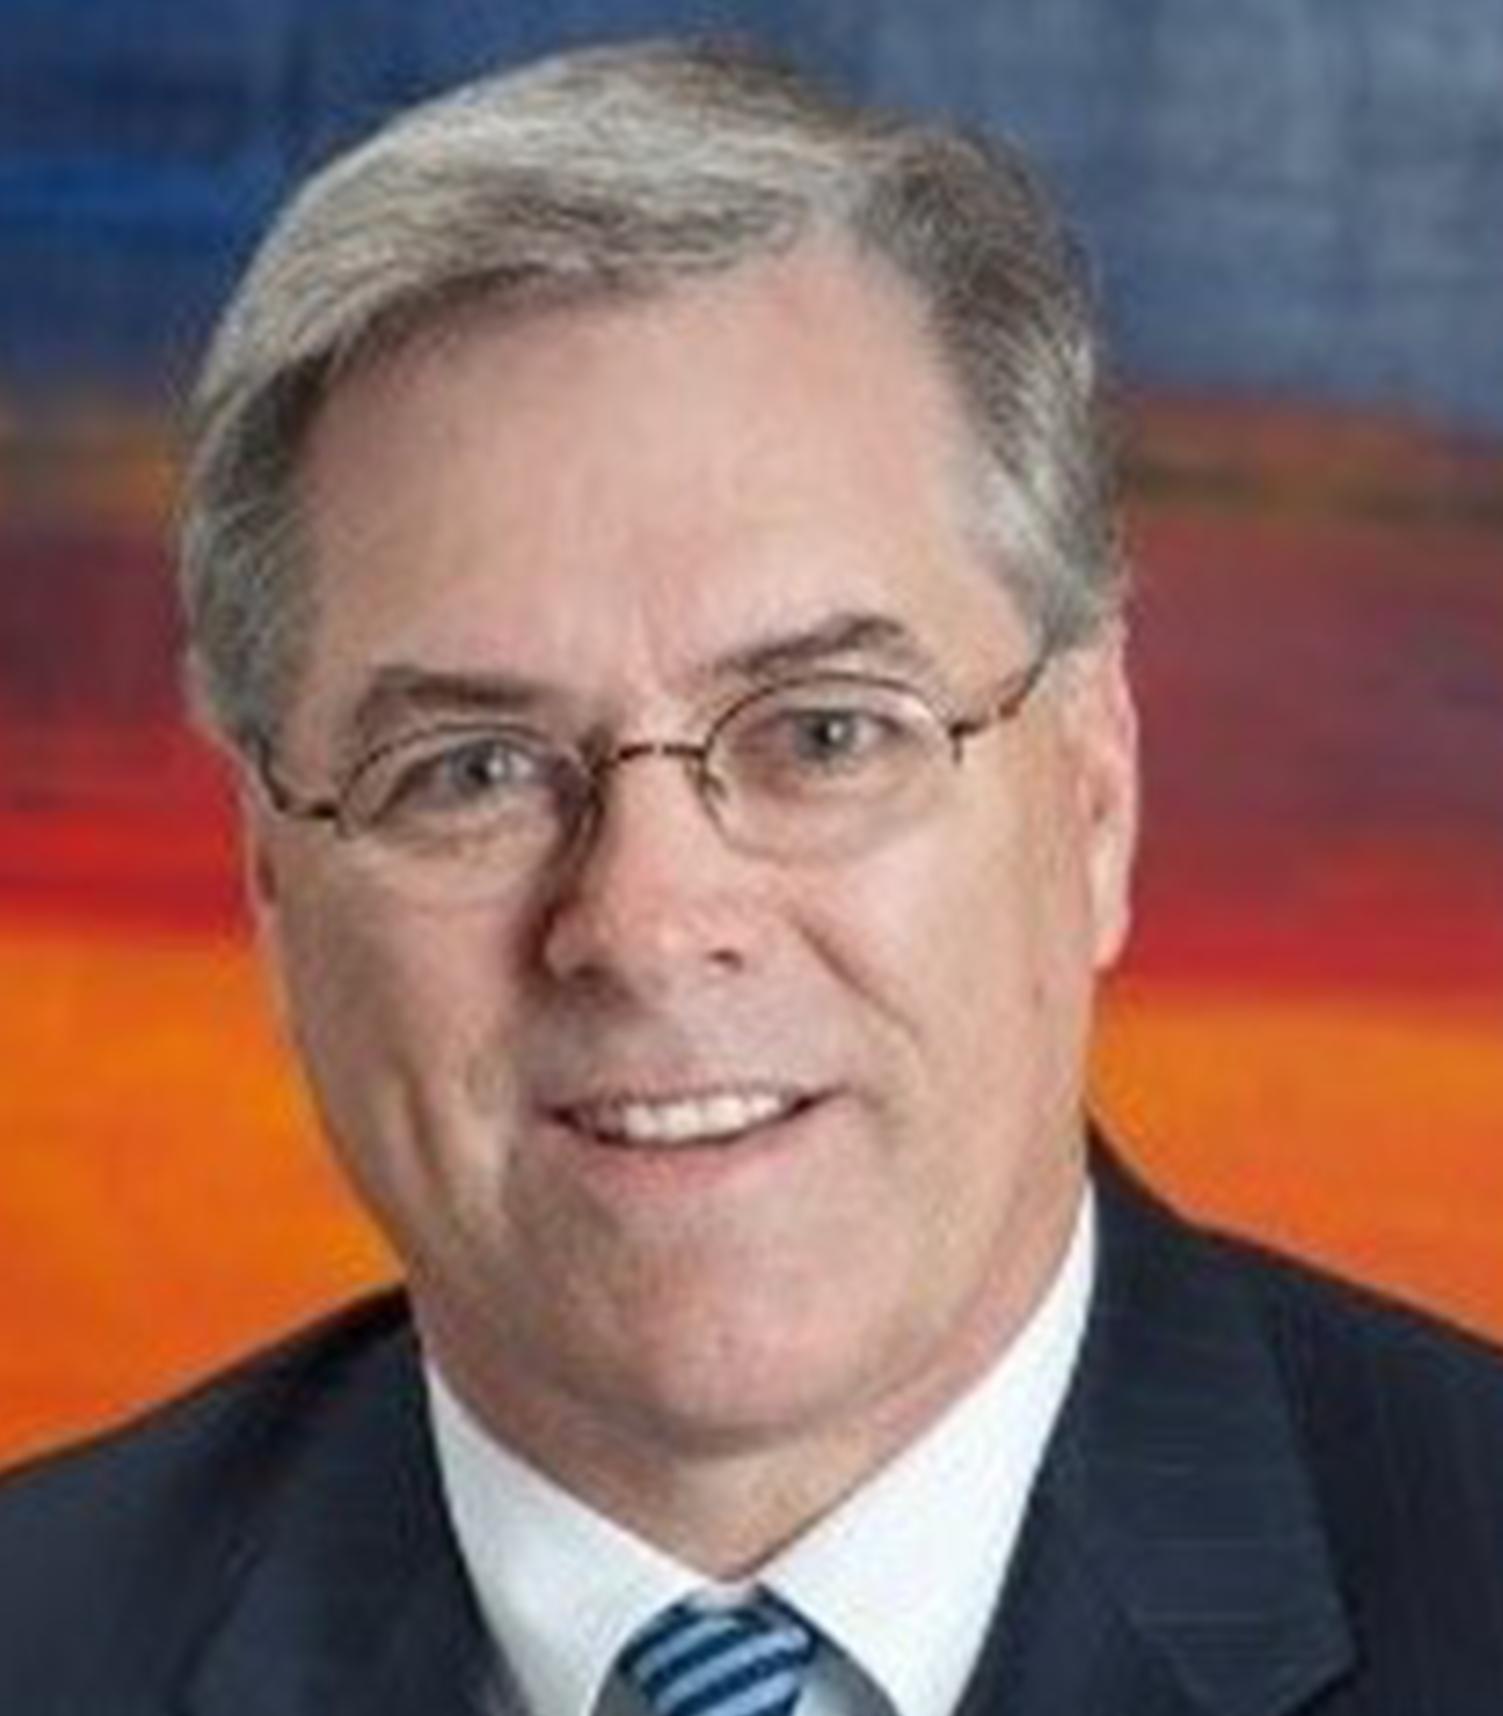 Michael Hoffer